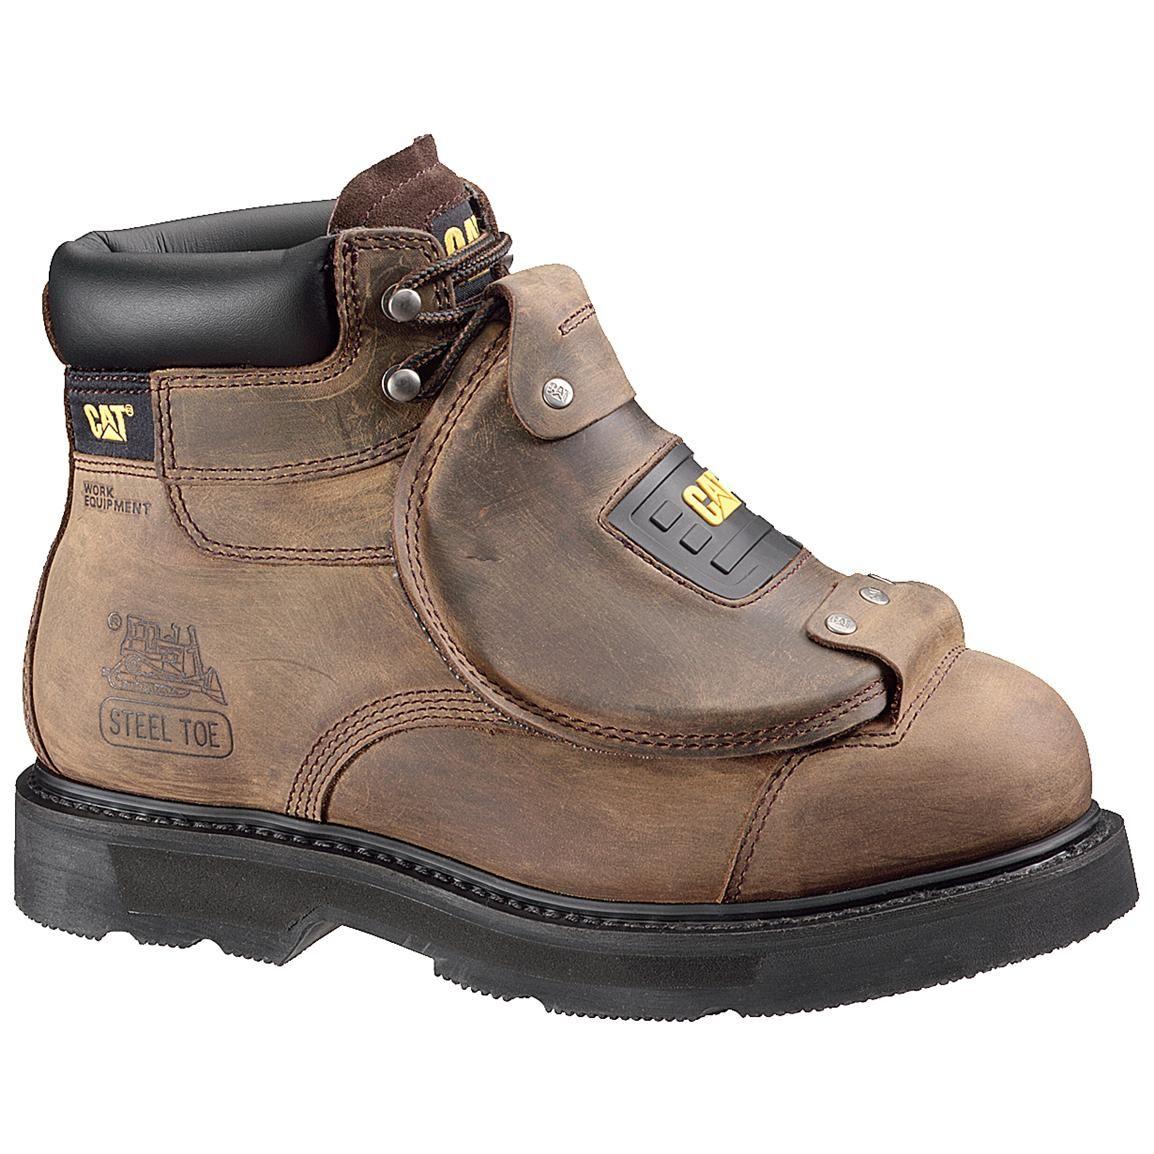 Fashionable steel toe work boots 19